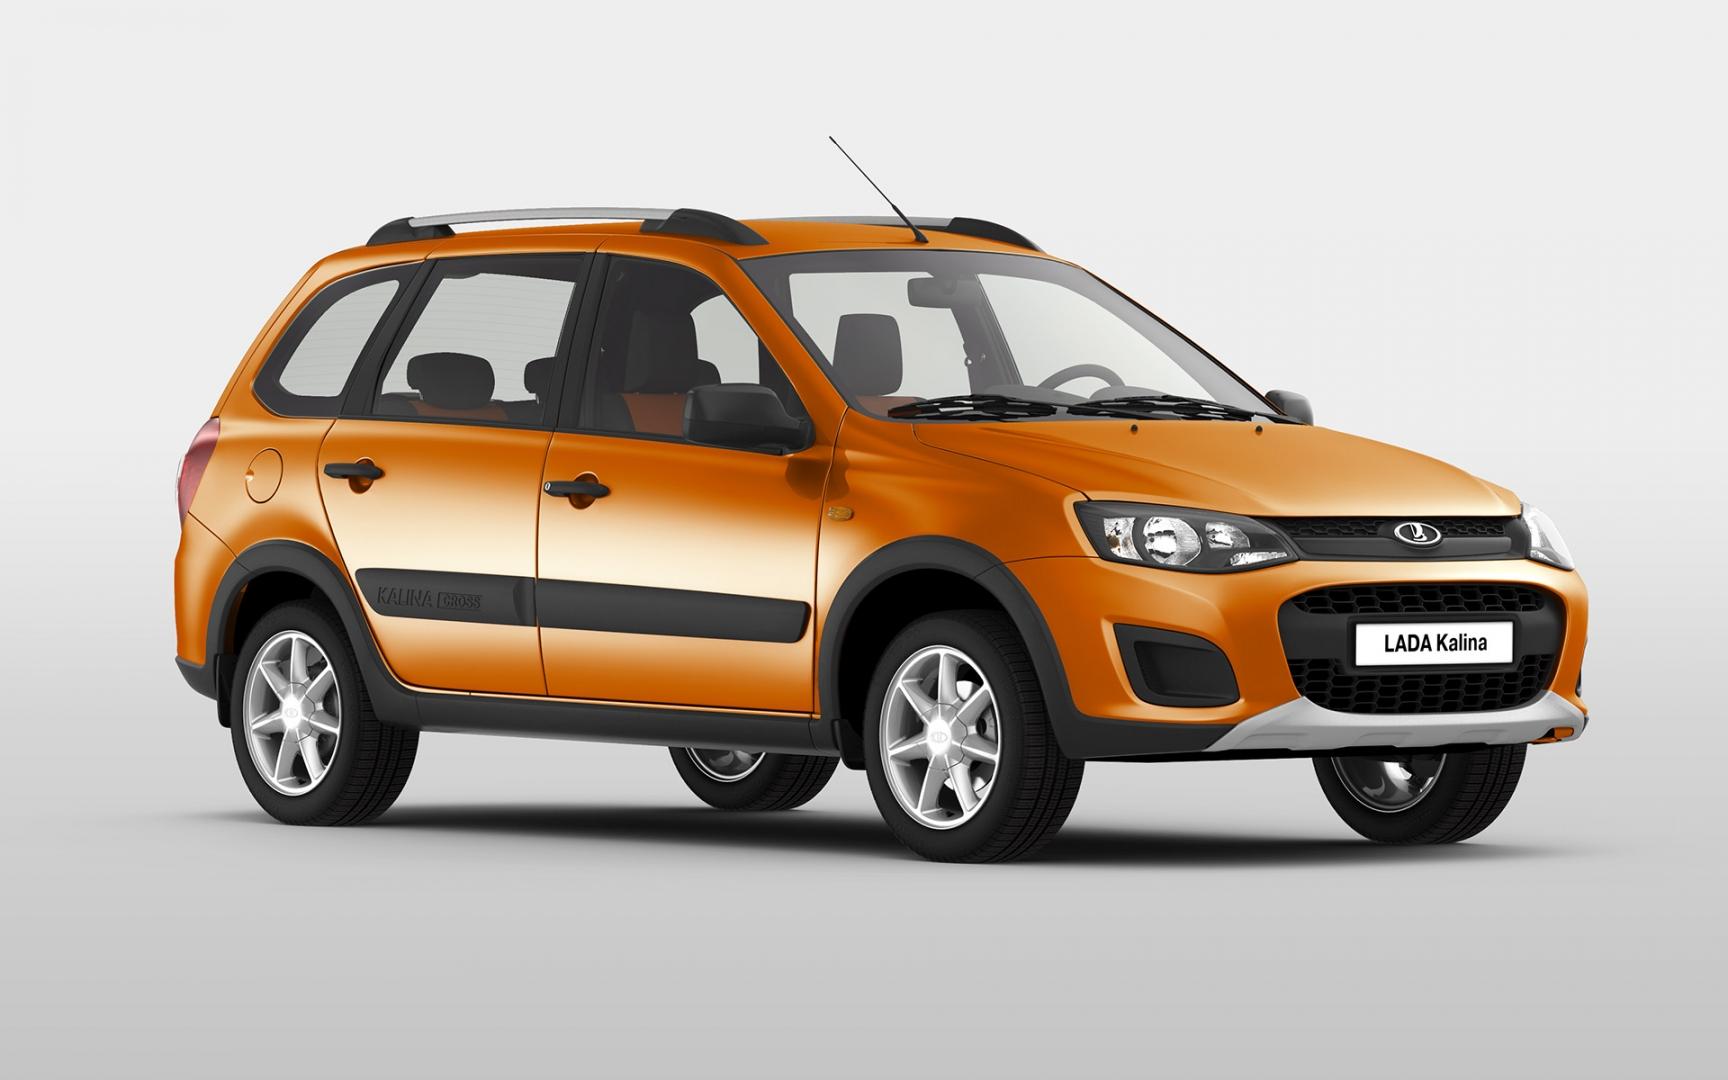 АвтоВАЗ обновил модели Lada Granta и Kalina